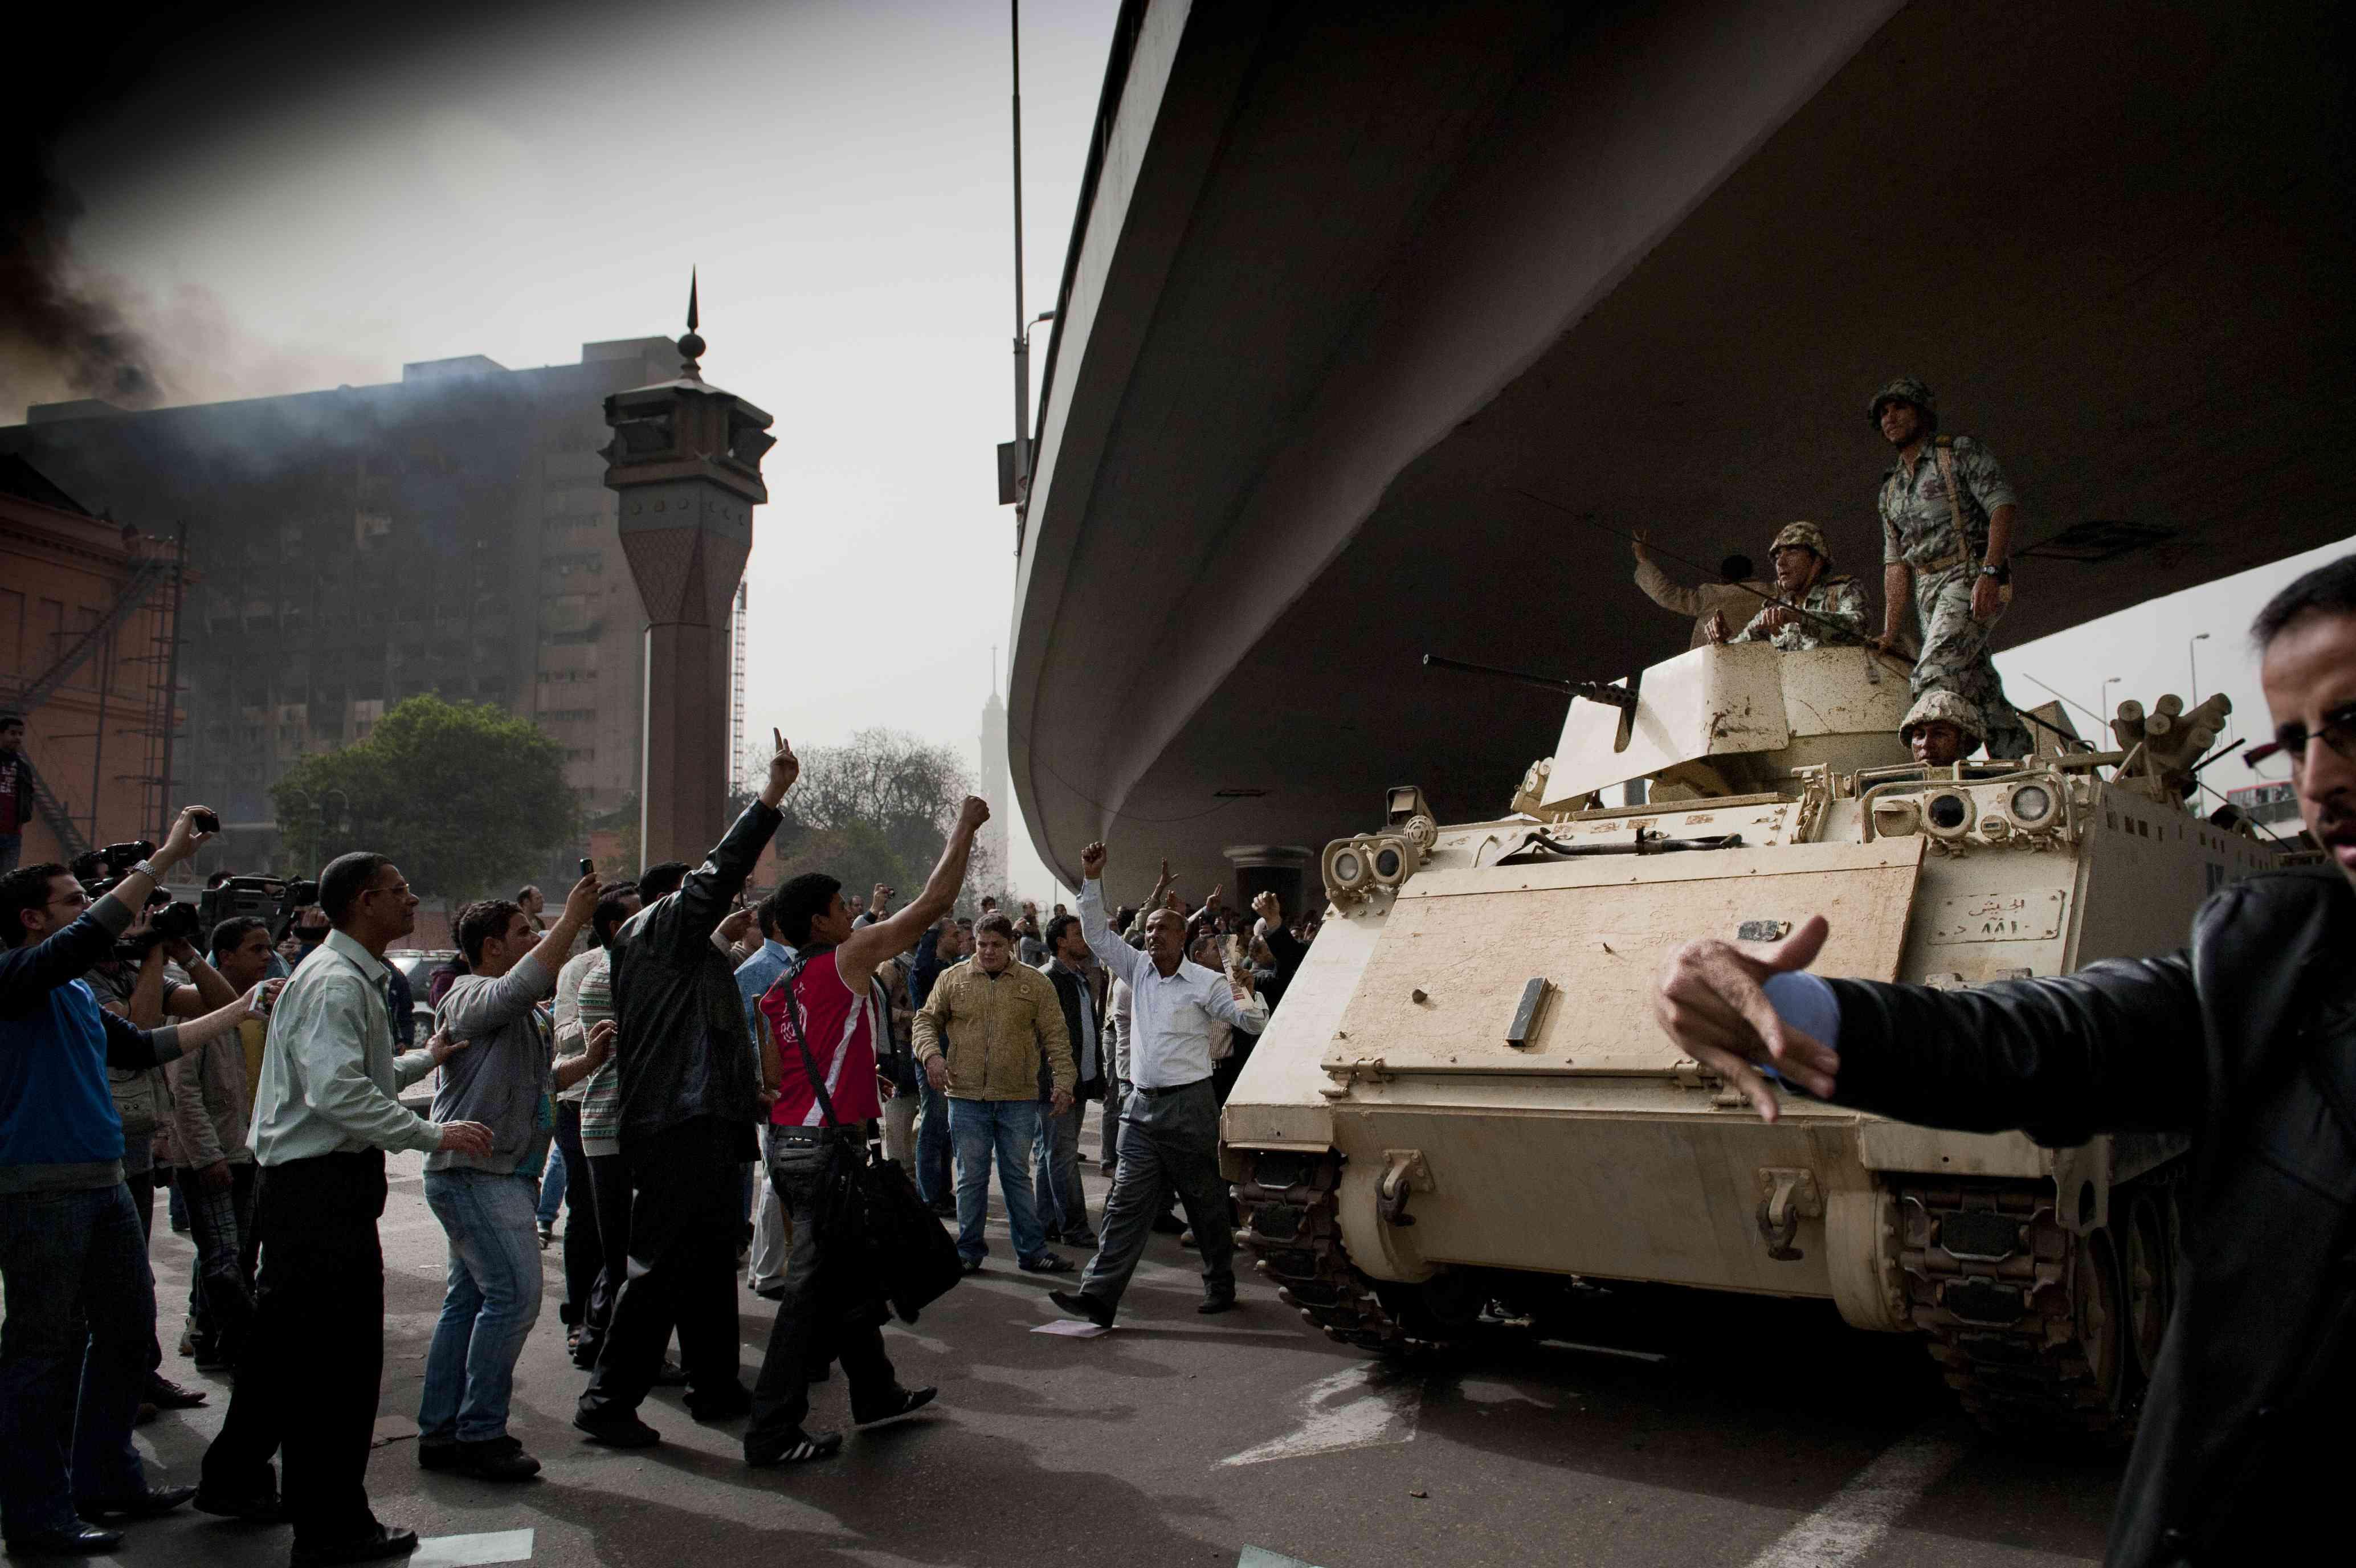 Egypt - Uprising in Cairo